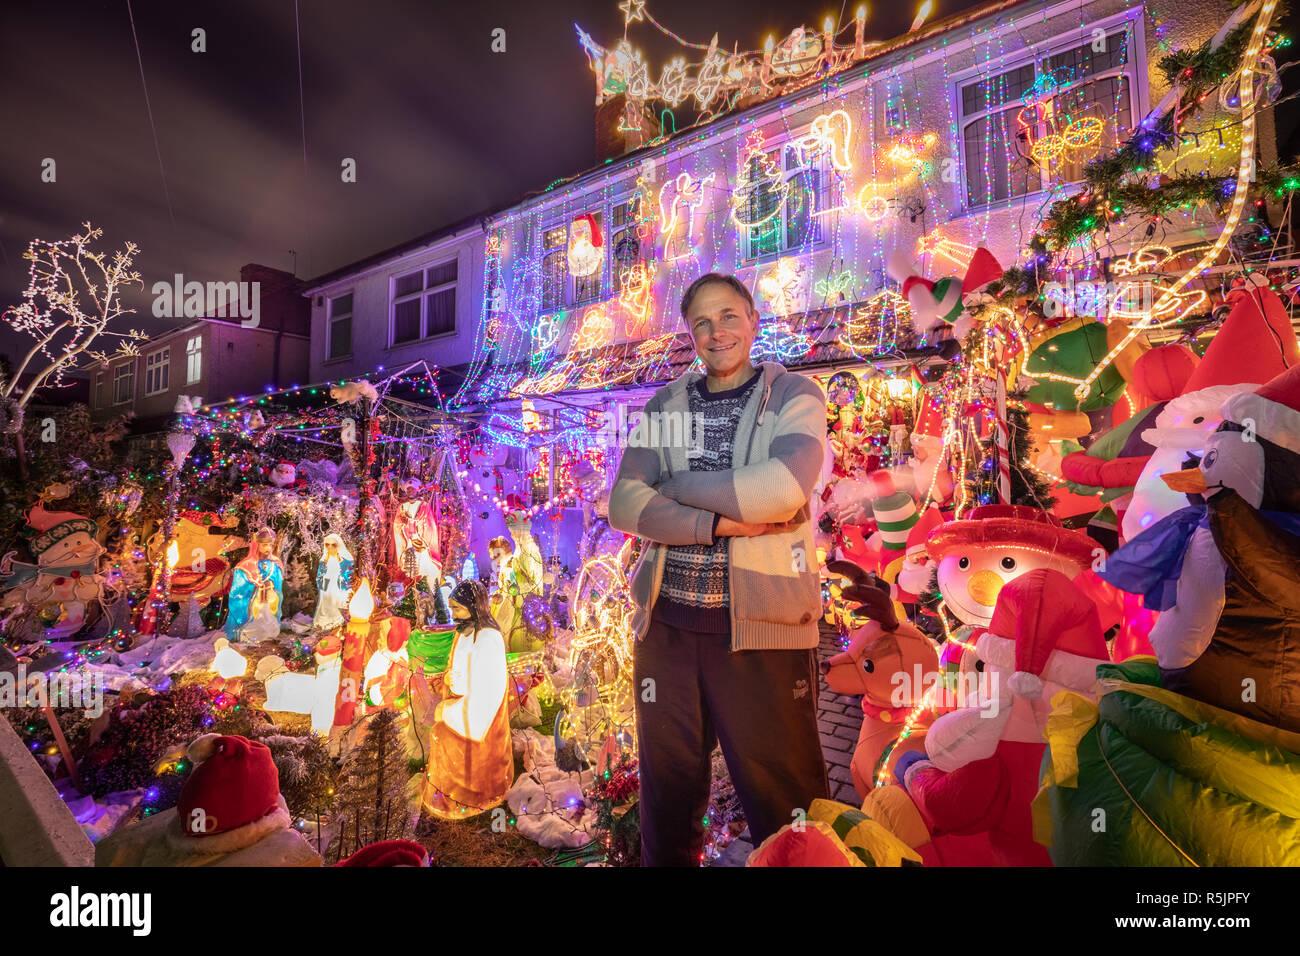 London, UK  1st Dec, 2018  Striking Christmas house lights display